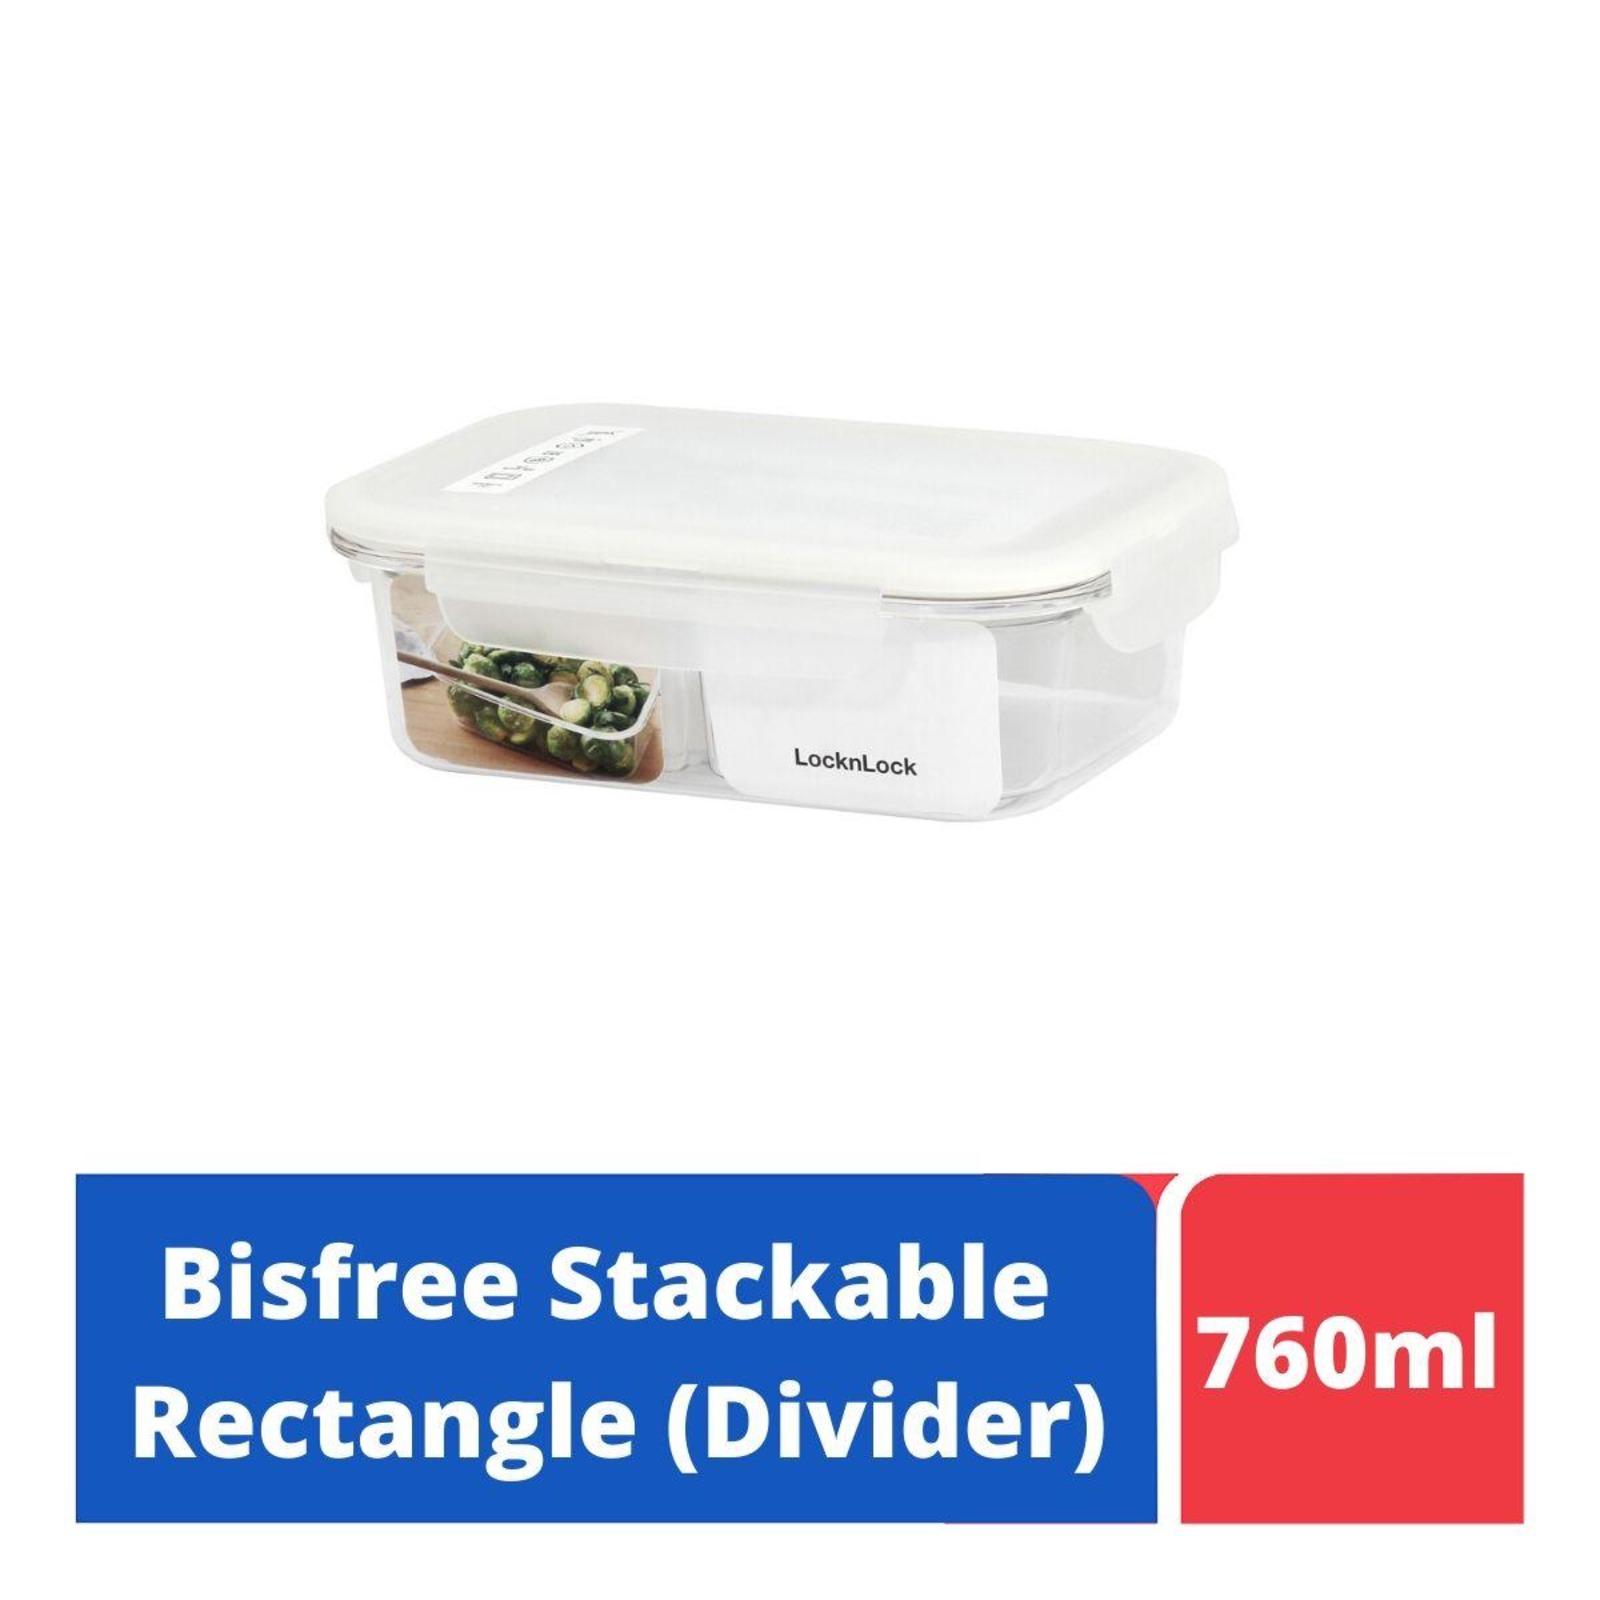 LOCK&LOCK Bisfree TableTop Container 760ml W/Divider-White